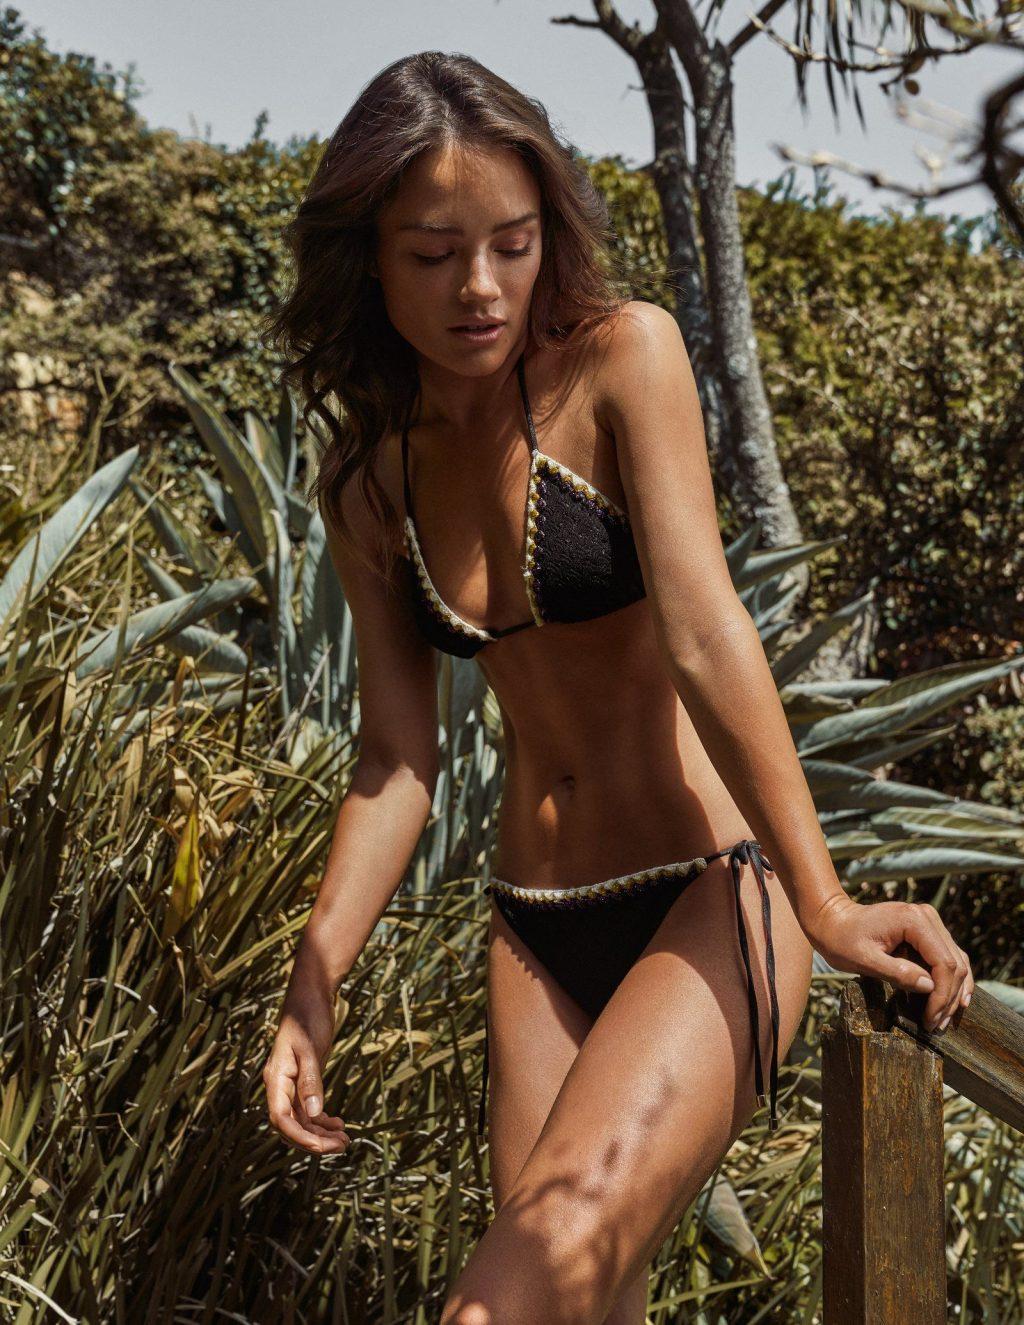 Jessica Lucas The Fappening jessica lee buchanan topless (5 photos) – ( ͡° ͜ʖ ͡°)  the